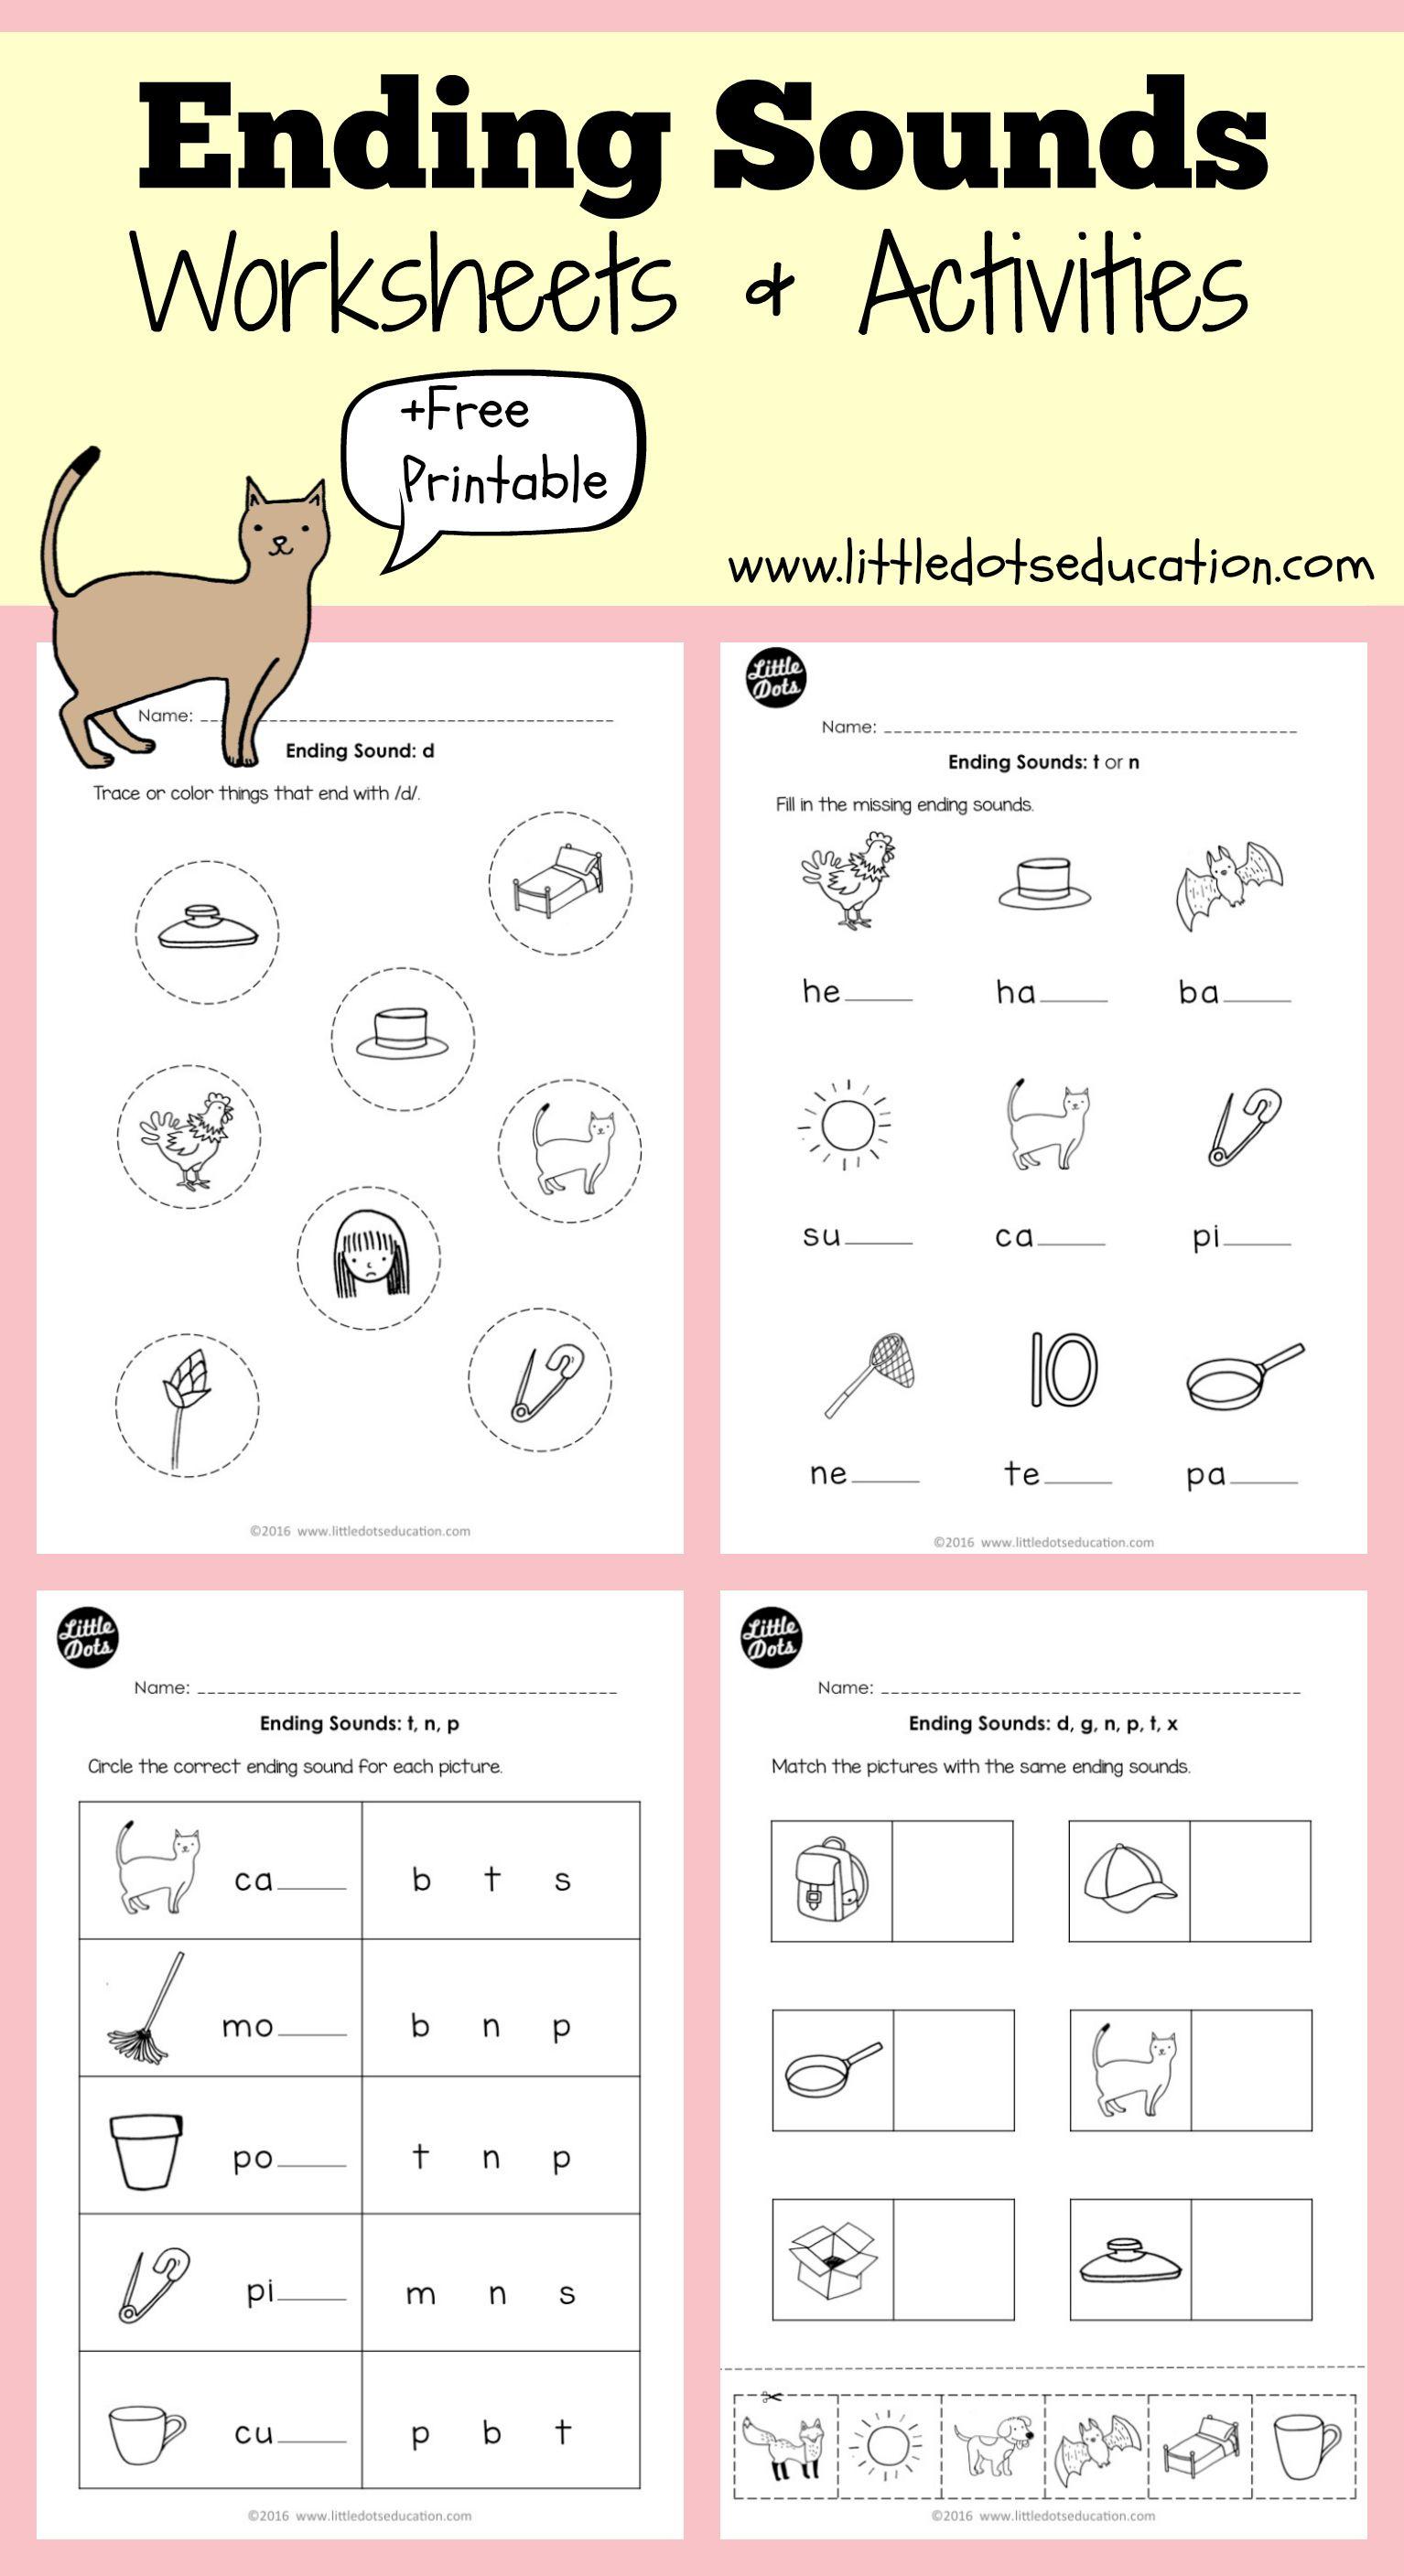 Worksheets Ending Sounds Worksheets download ending sounds worksheets and activities for preschool or kindergarten class learn the d g n p t